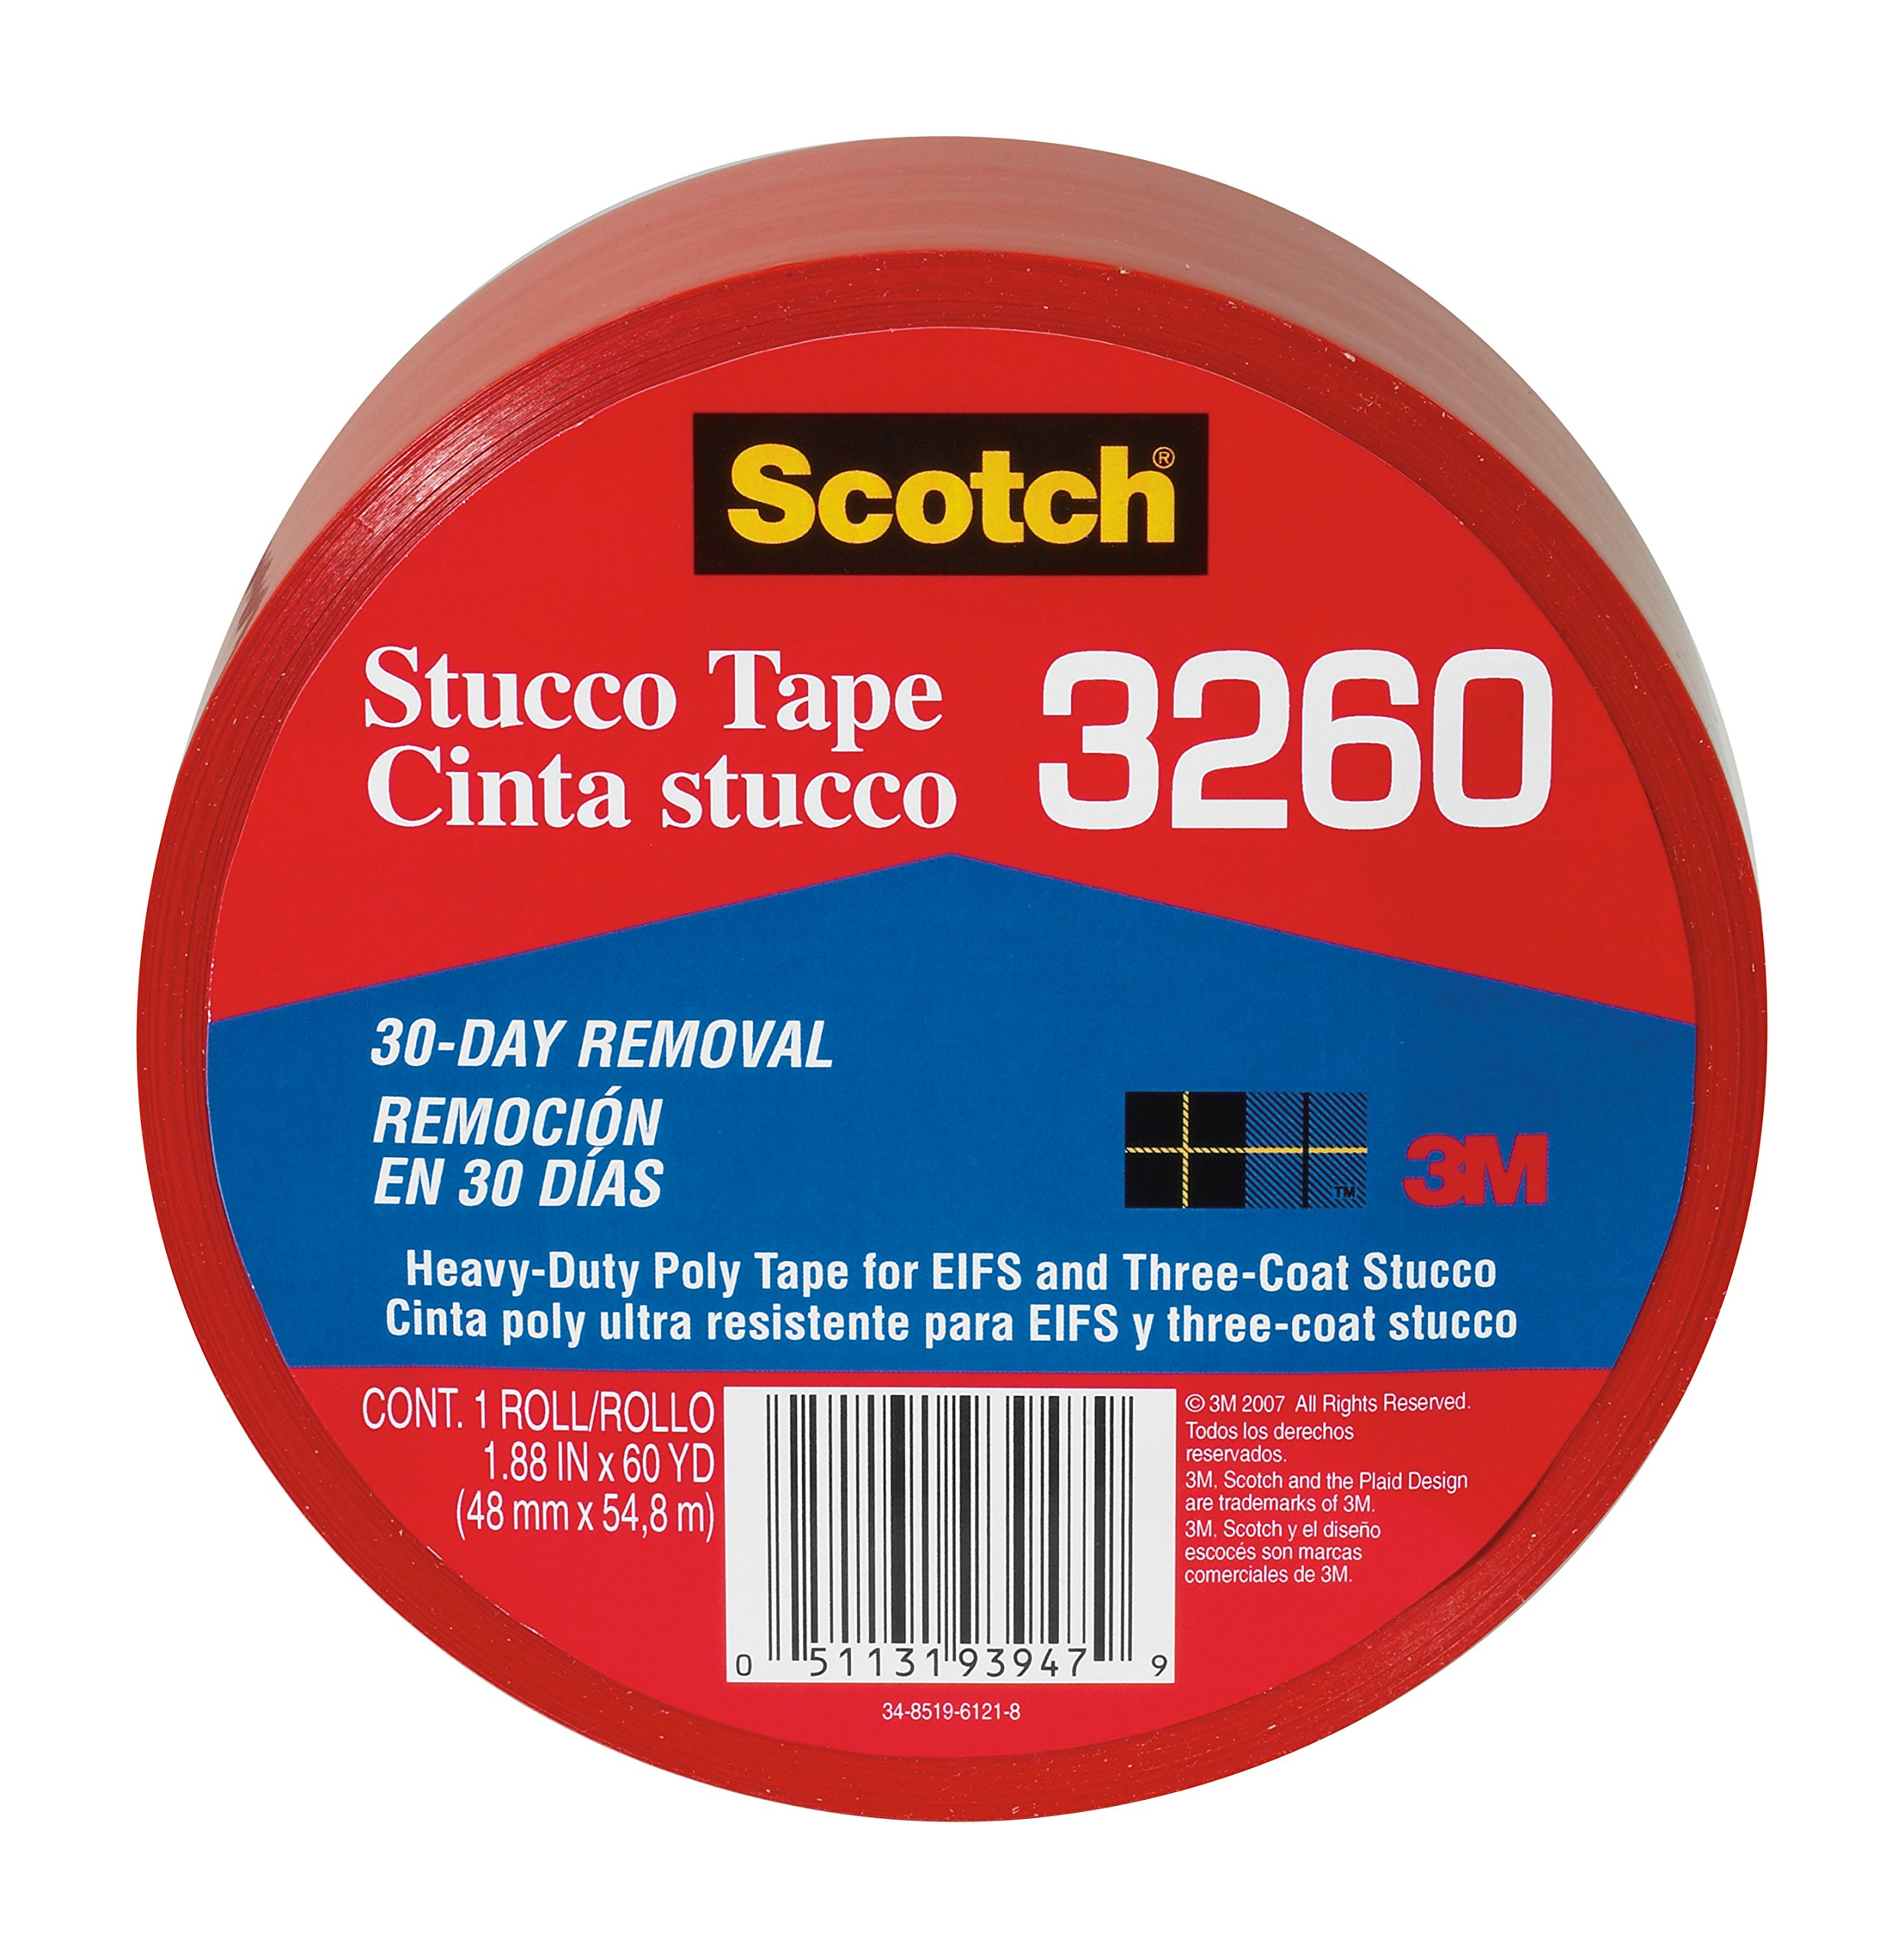 Scotch Stucco Tape, 3260-A, 1.88-Inch by 60-Yards, 1 Roll